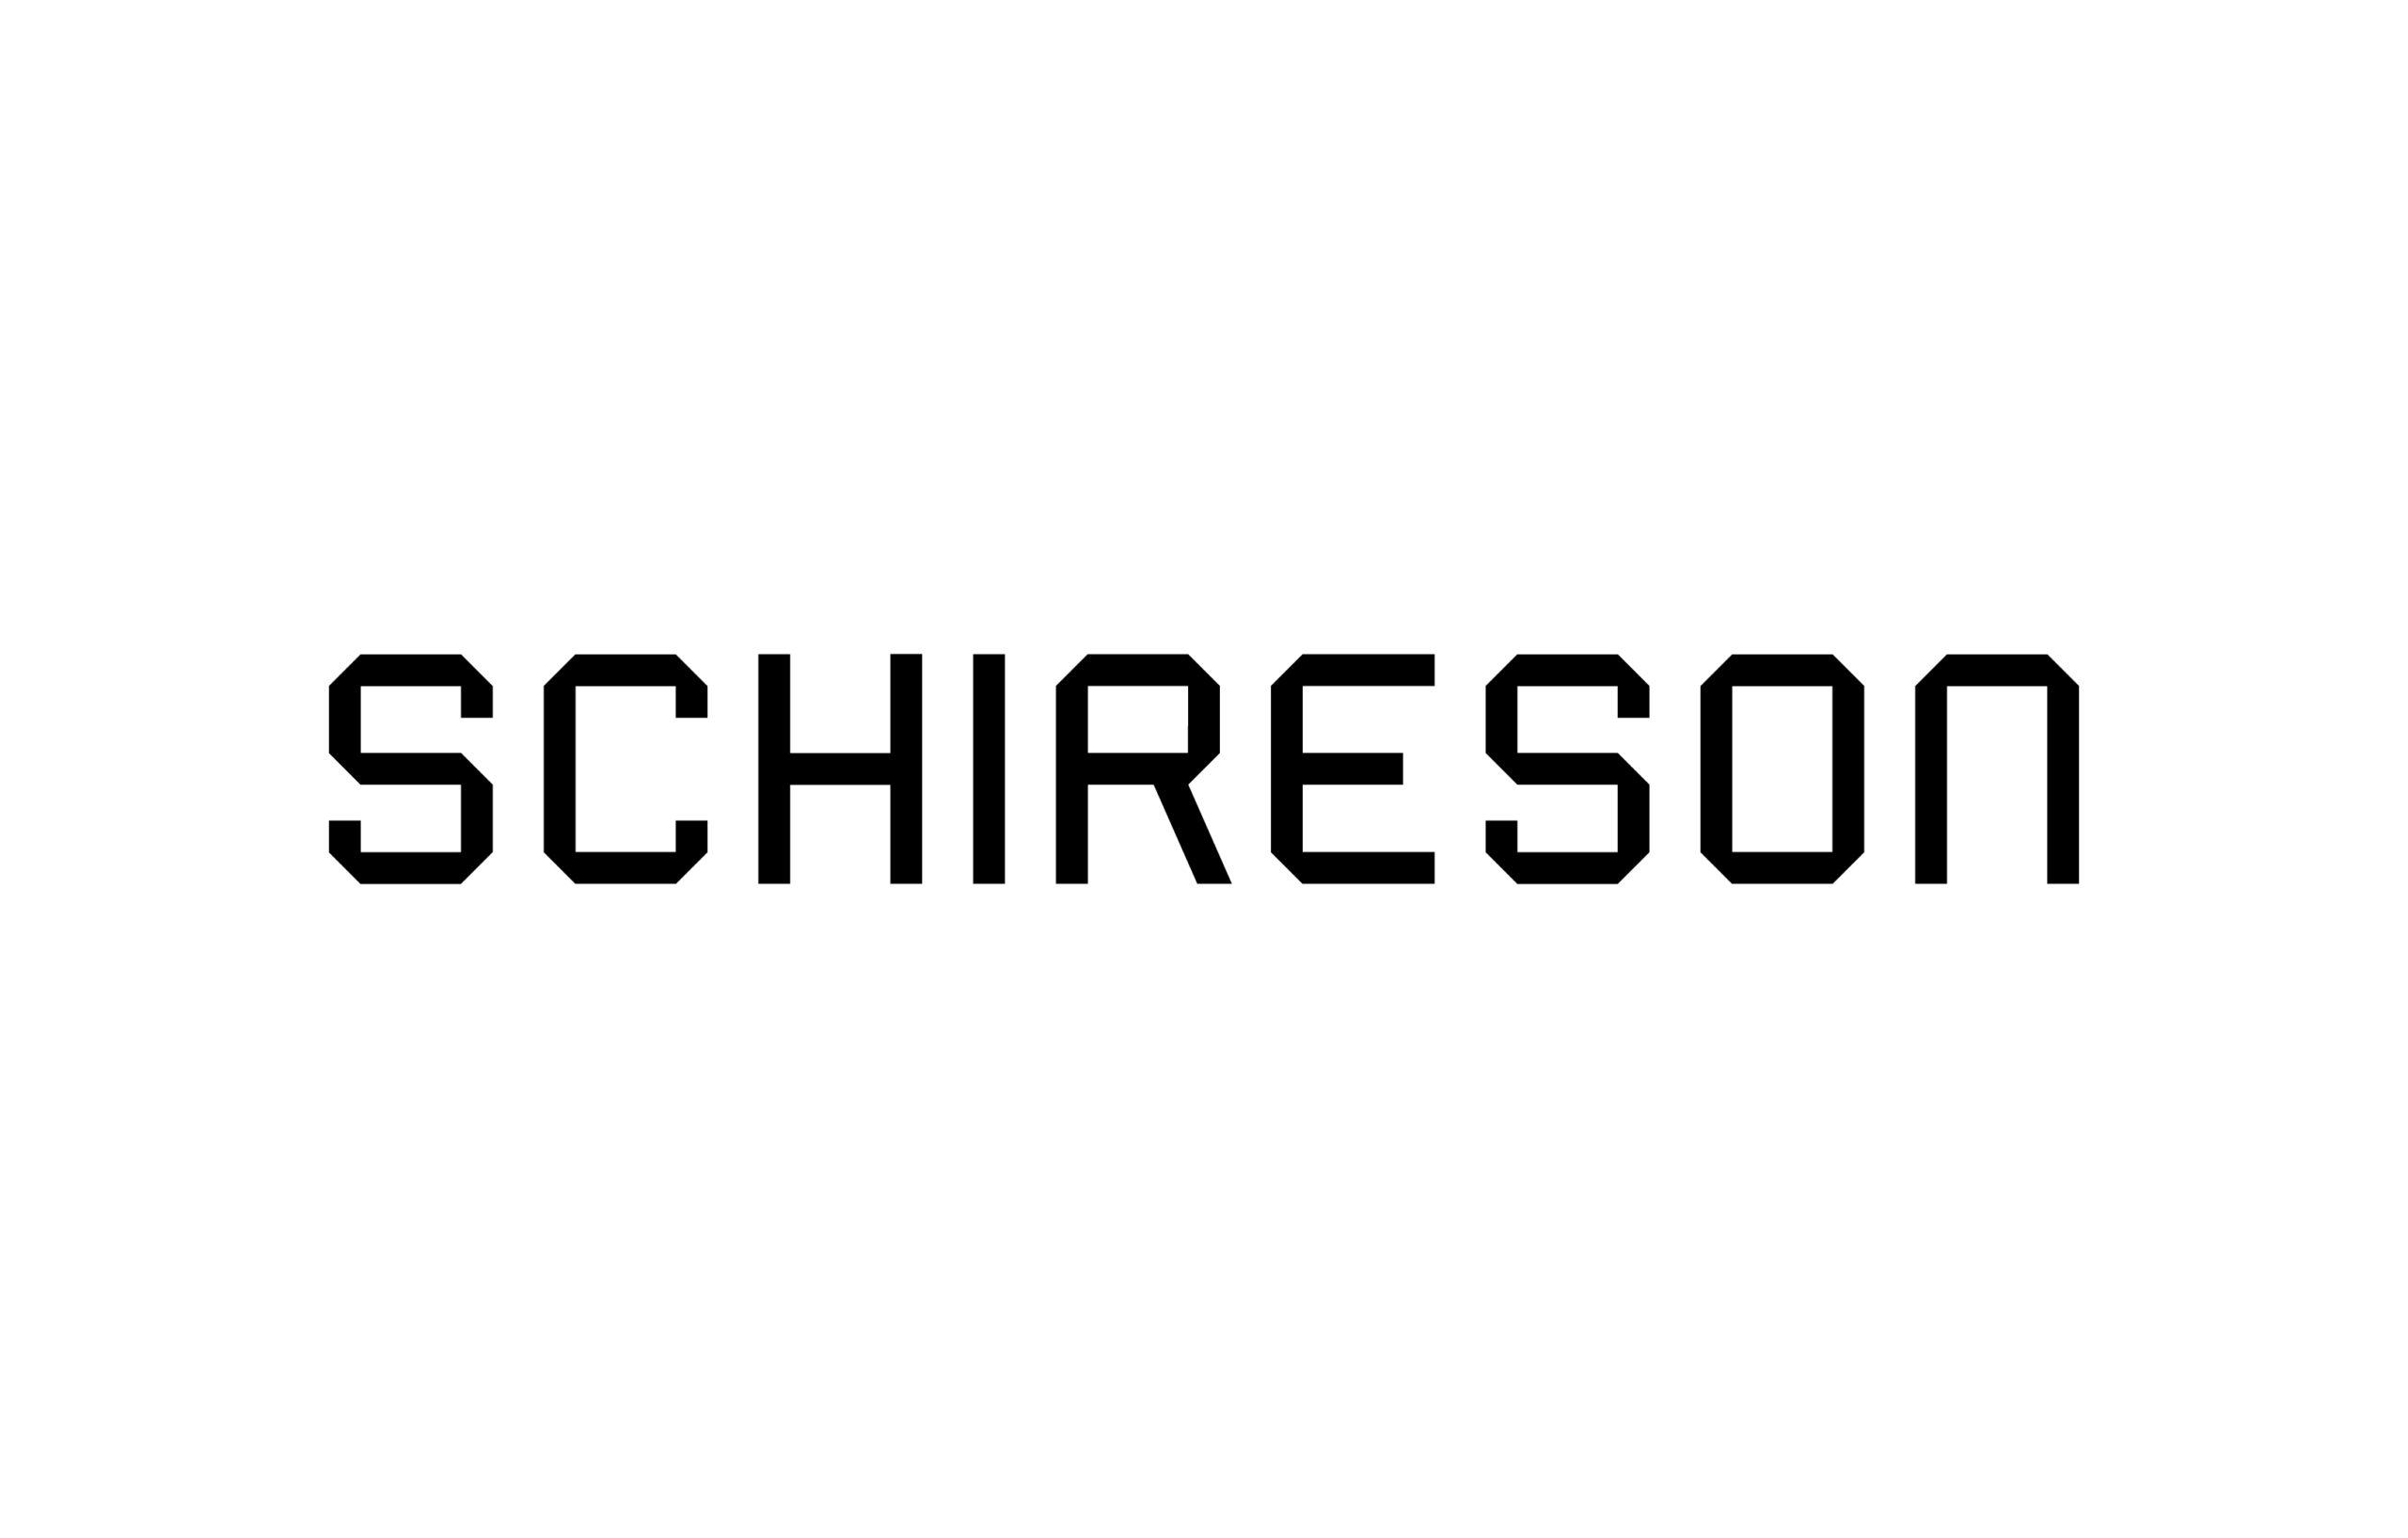 Schireson-new-logo